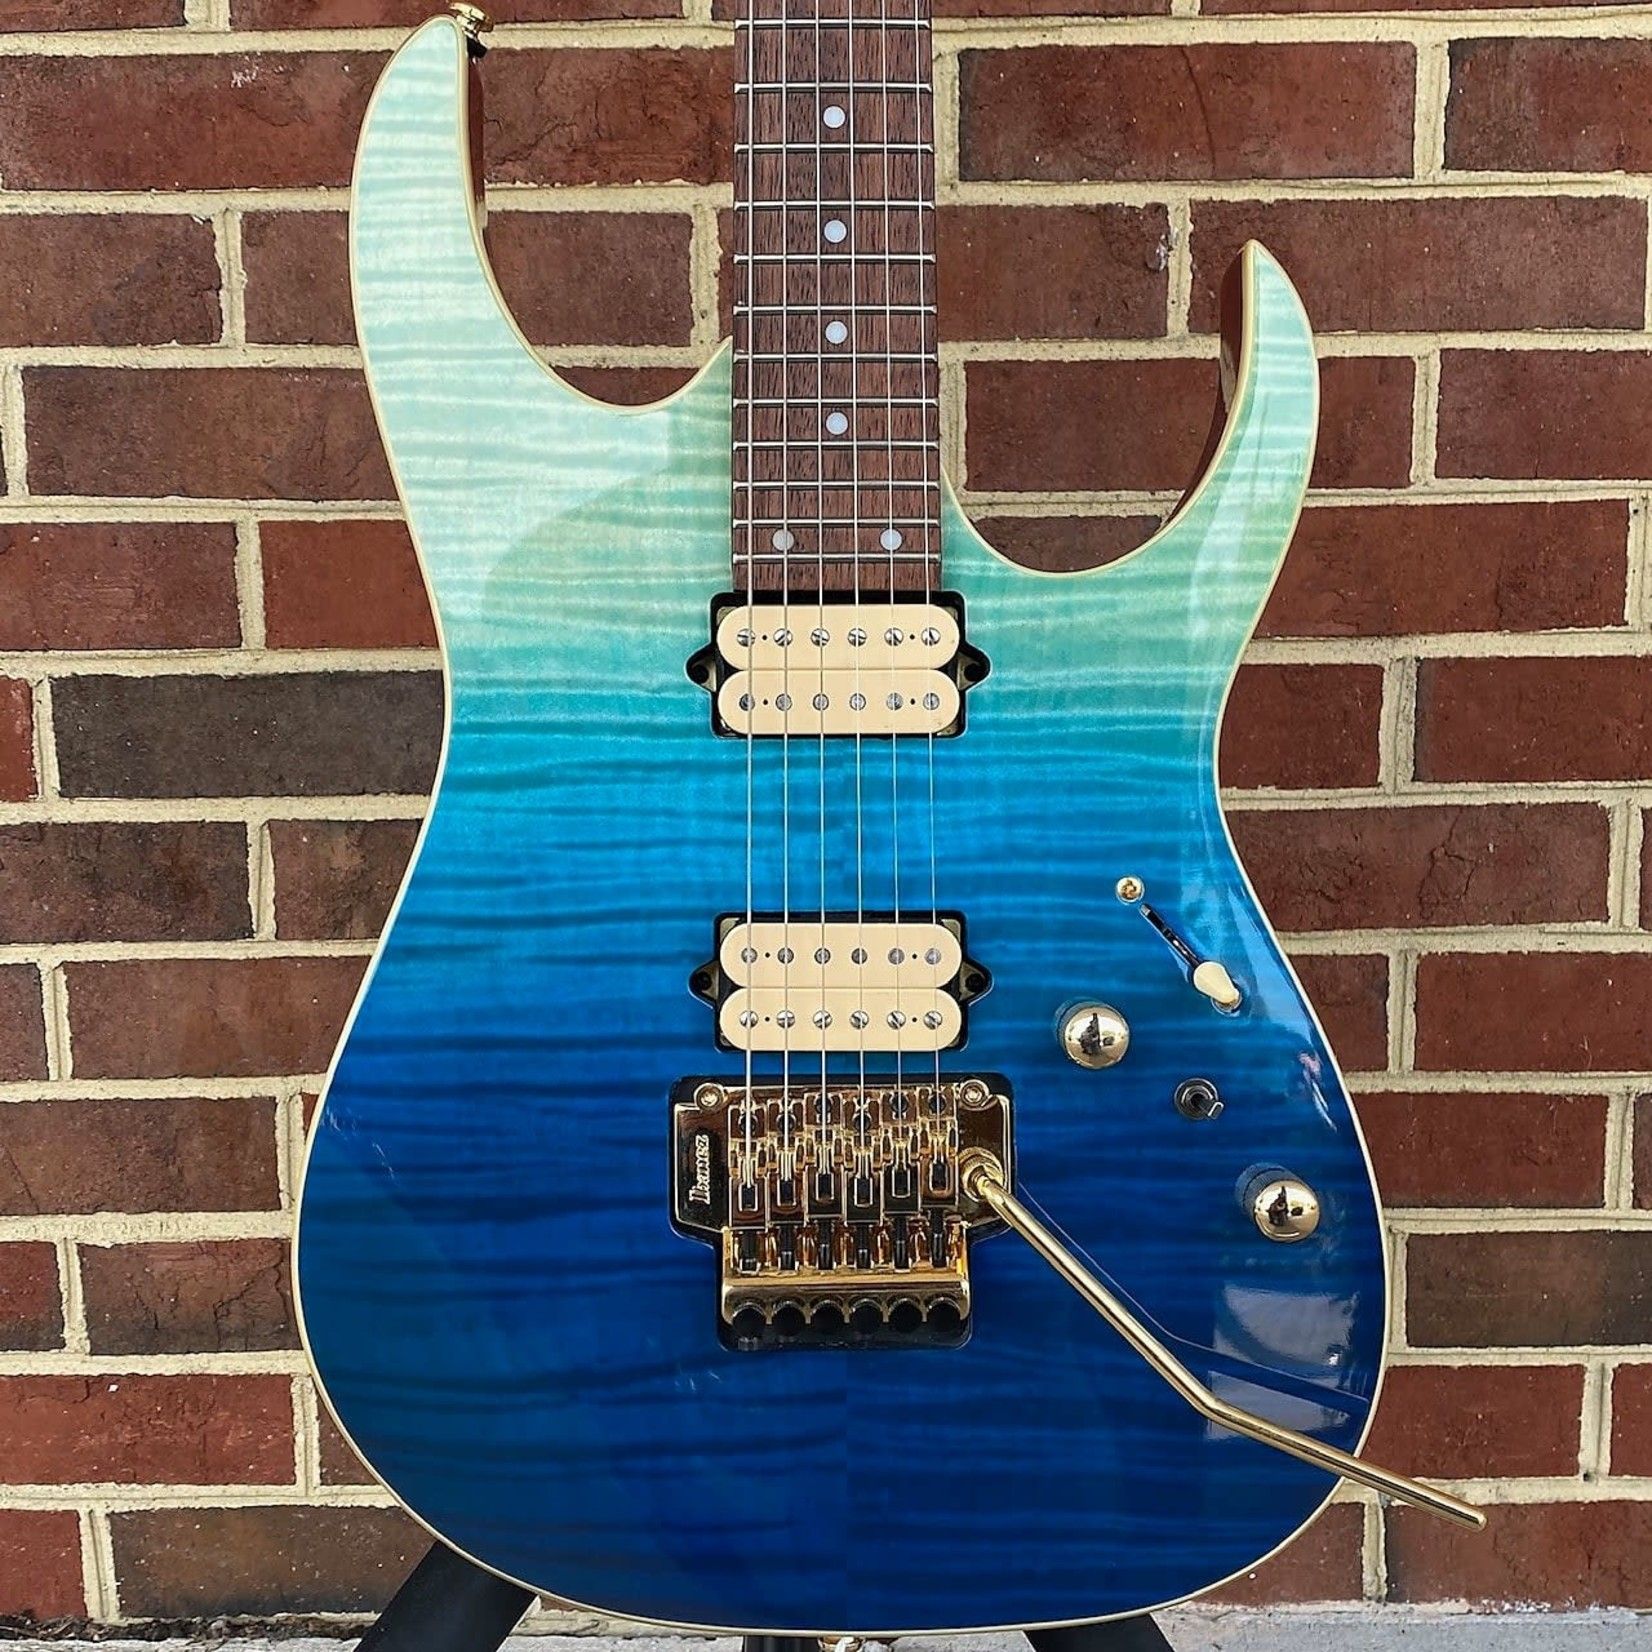 Ibanez Ibanez RG420HPFMBRG, High Performance, Blue Reed Gradation, Locking Trem, DiMarzio Tone Zone & Air Norton